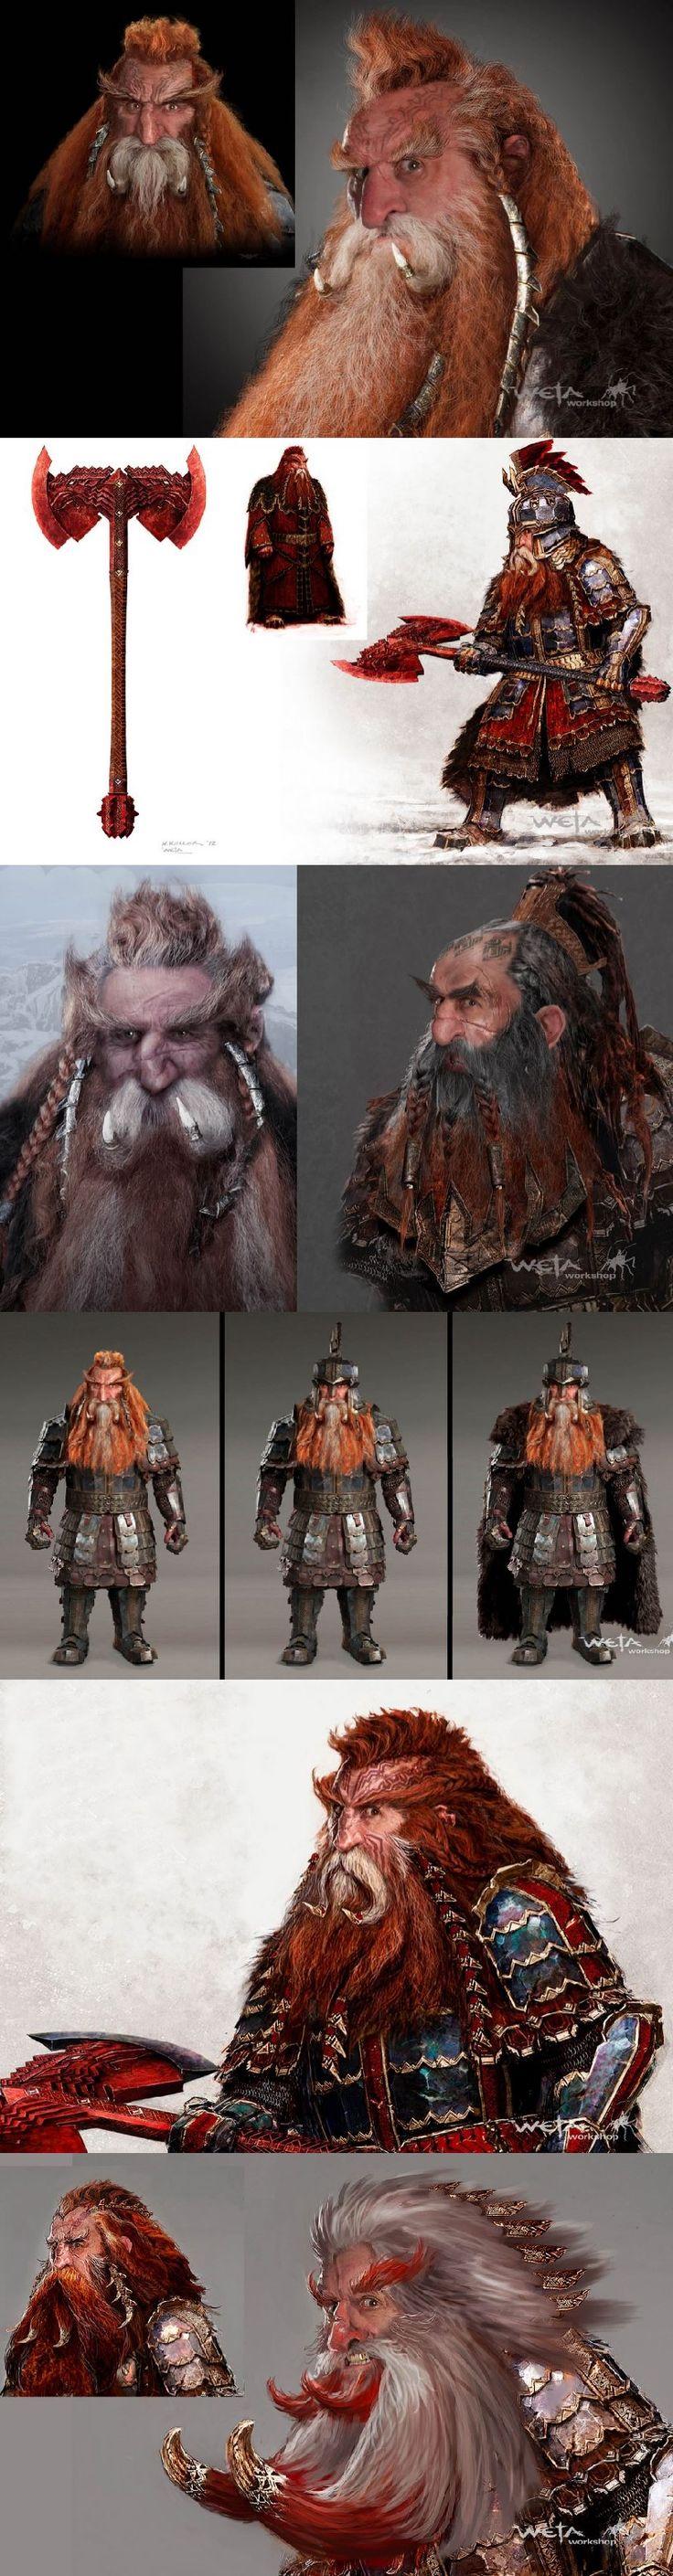 BOTFA Dain concept art / The Hobbit: The Battle of the Five Armies Chronicles: Art & Design